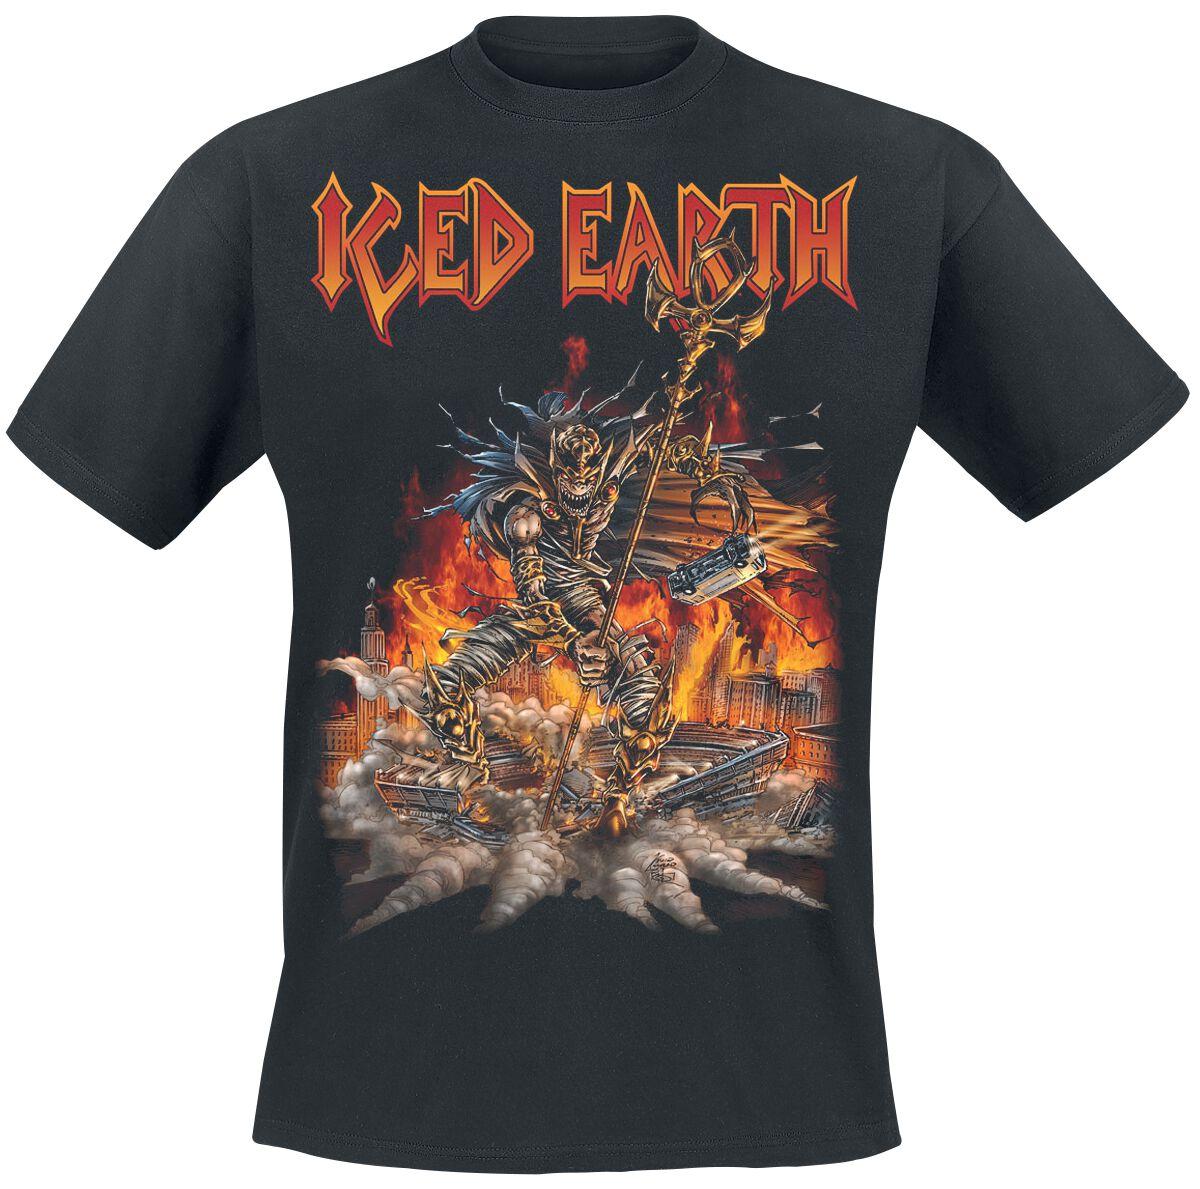 Zespoły - Koszulki - T-Shirt Iced Earth Incorruptible T-Shirt czarny - 362061